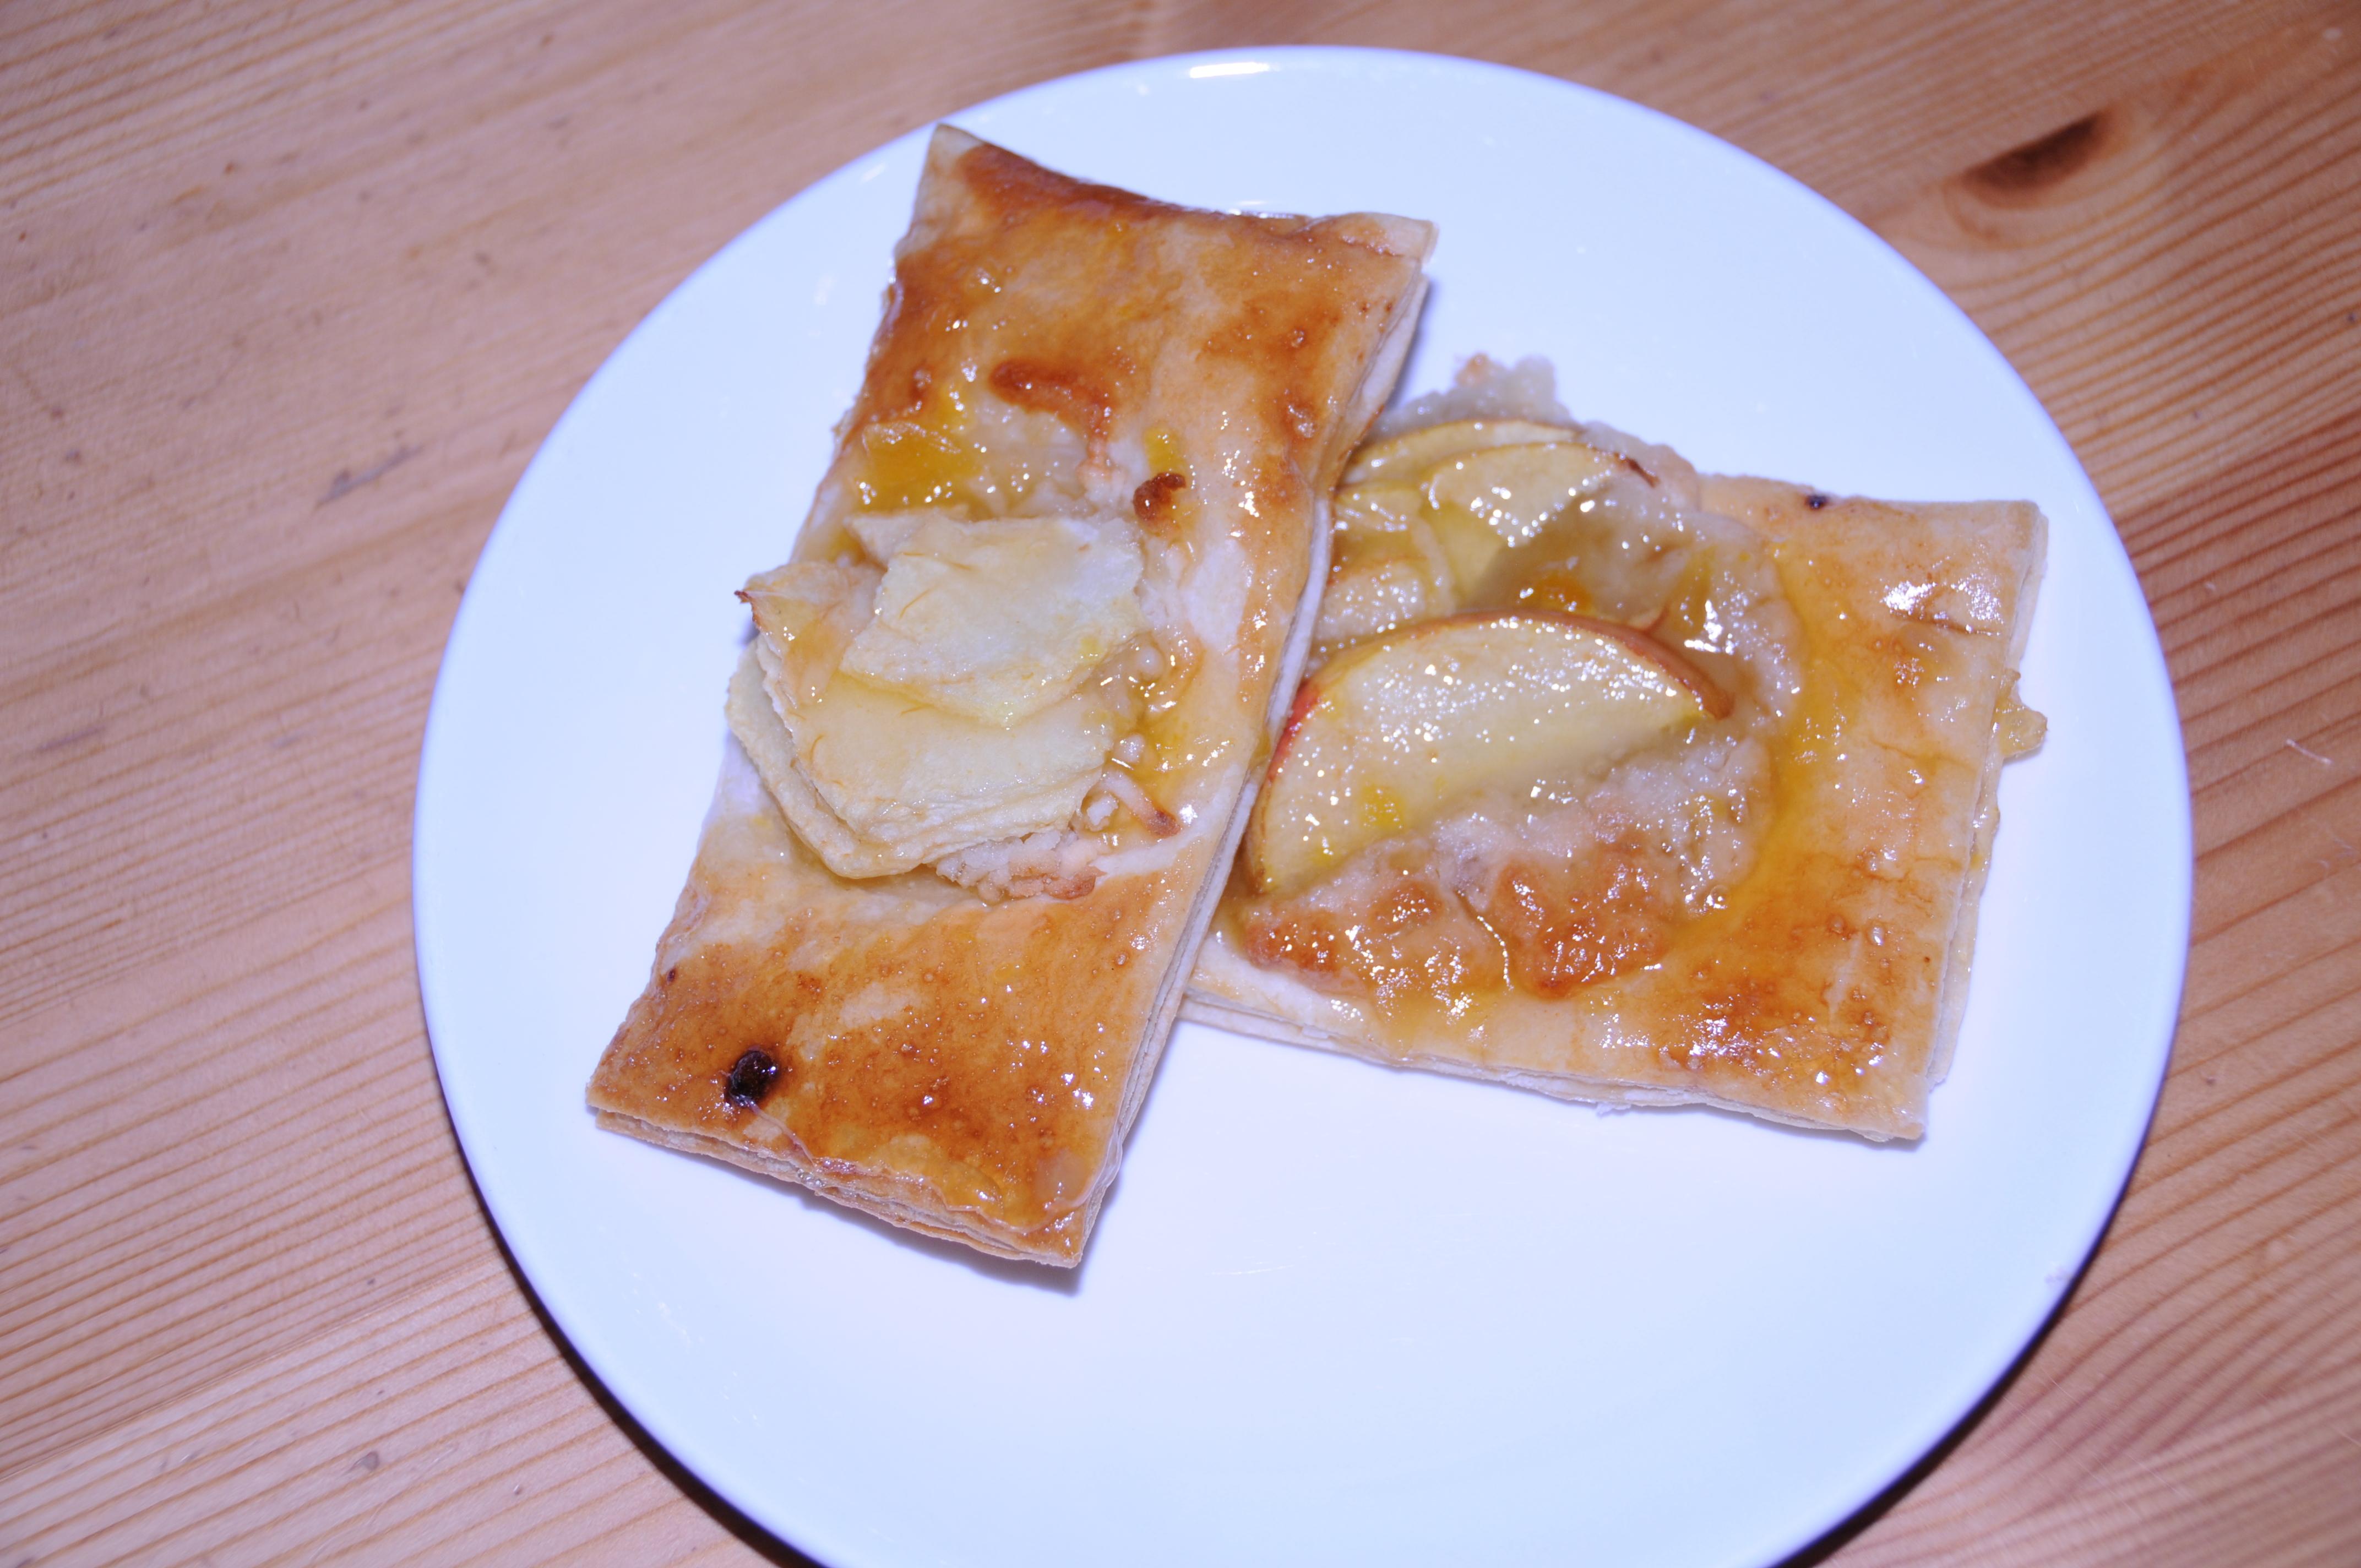 äpple smördeg calvados